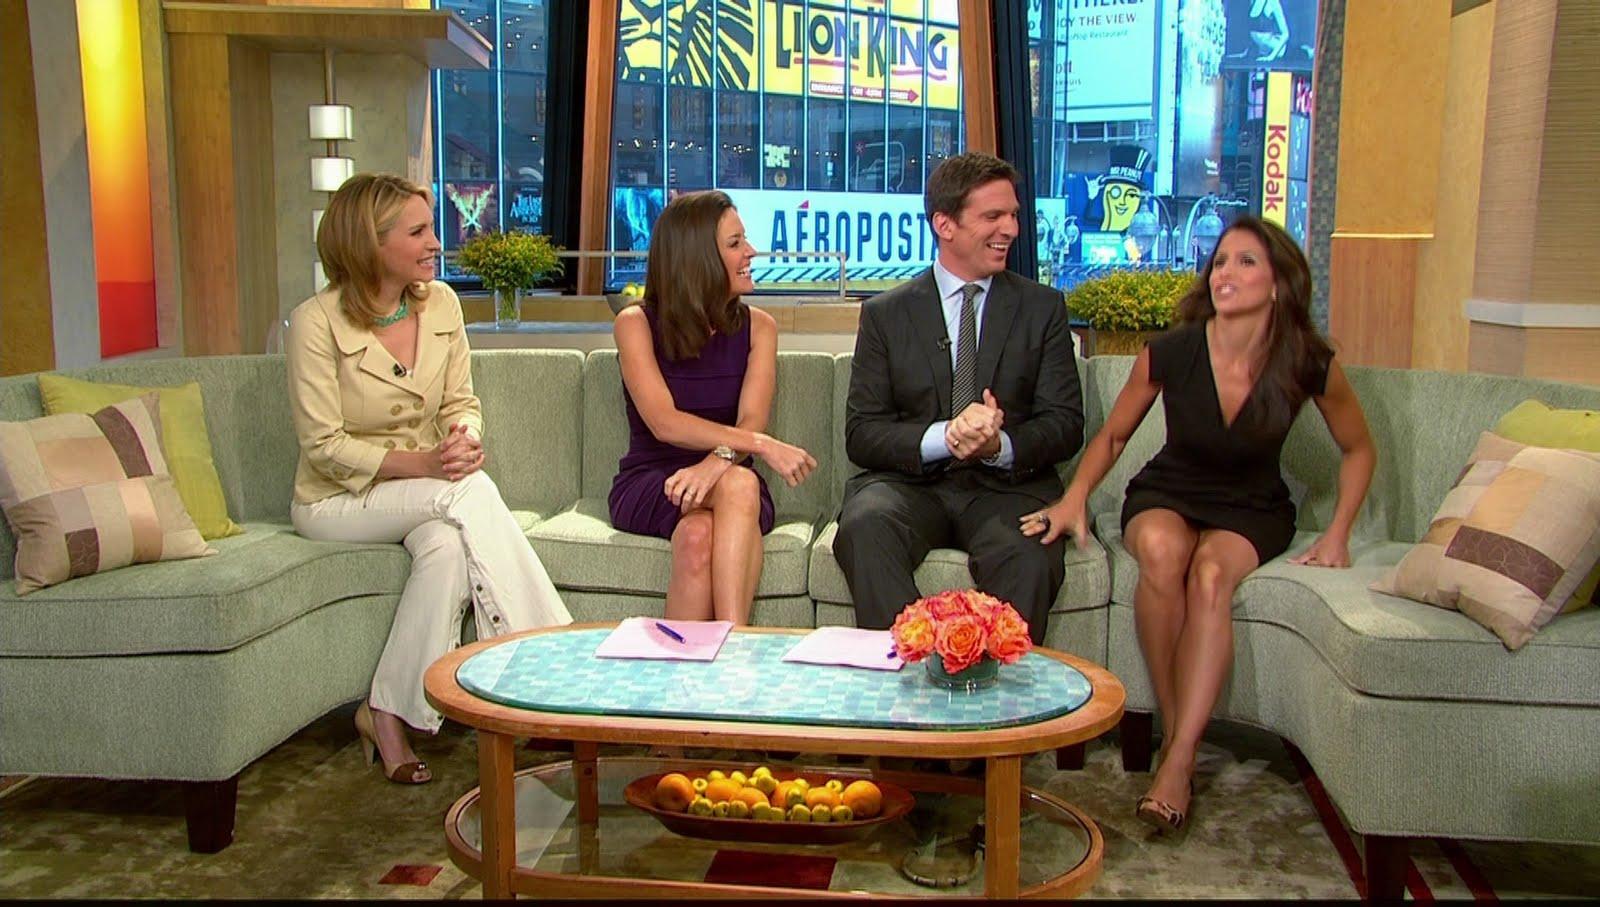 http://3.bp.blogspot.com/_te_-NCYOffc/TE9yjBxRH5I/AAAAAAAACK4/d0rNlhTl9rM/s1600/Marysol_Castro_legs_2.jpg